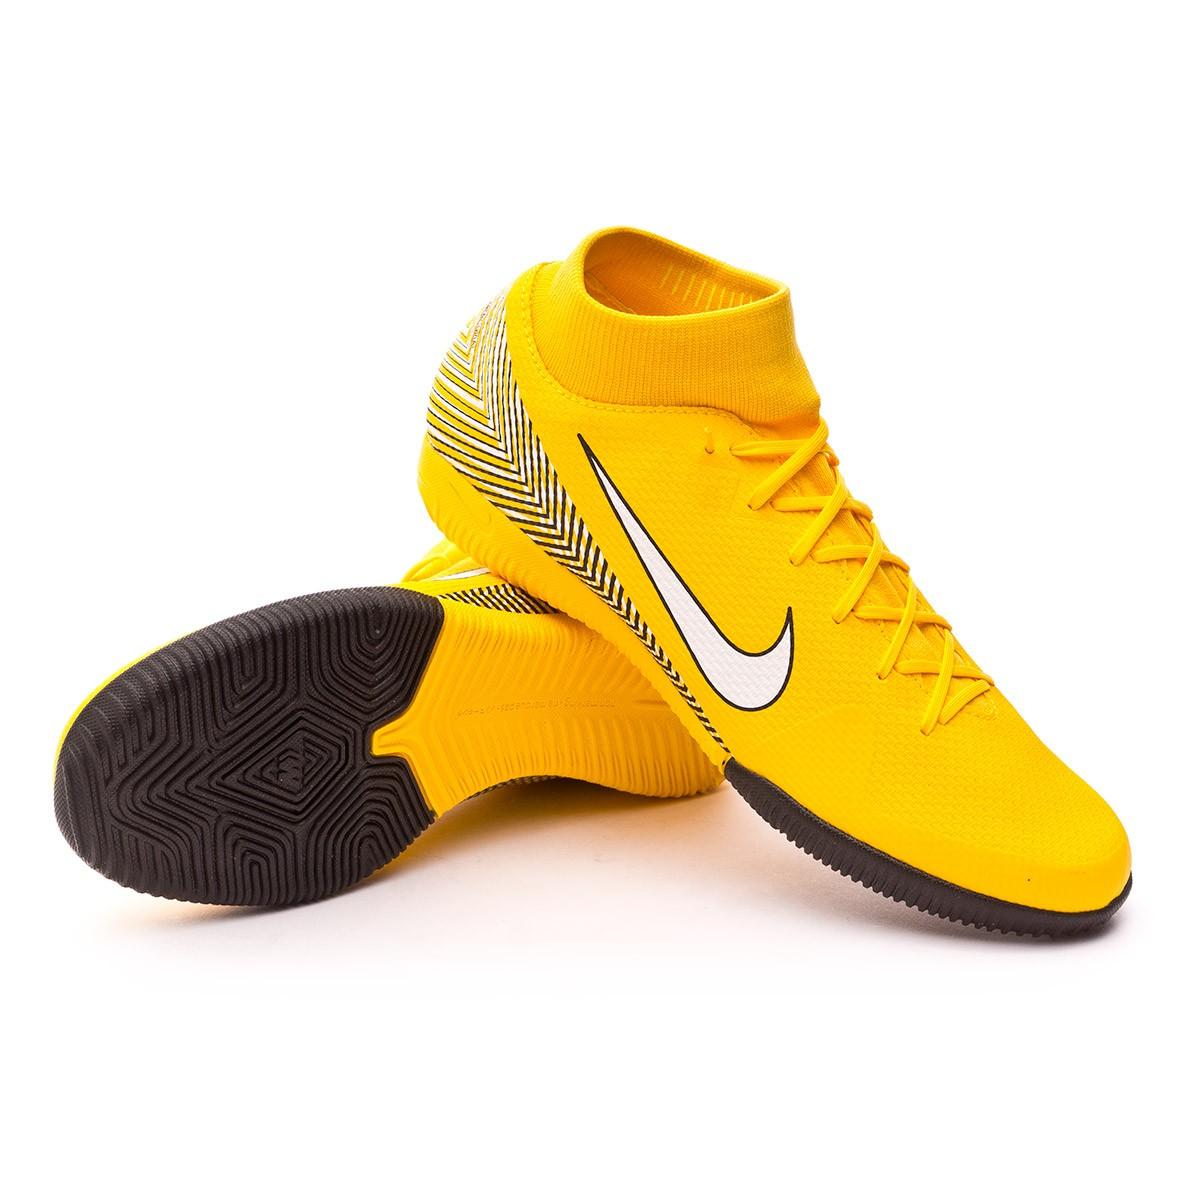 5a8a3b210b Tenis Nike Mercurial SuperflyX VI Academy IC Neymar Yellow-Black - Tienda  de fútbol Fútbol Emotion